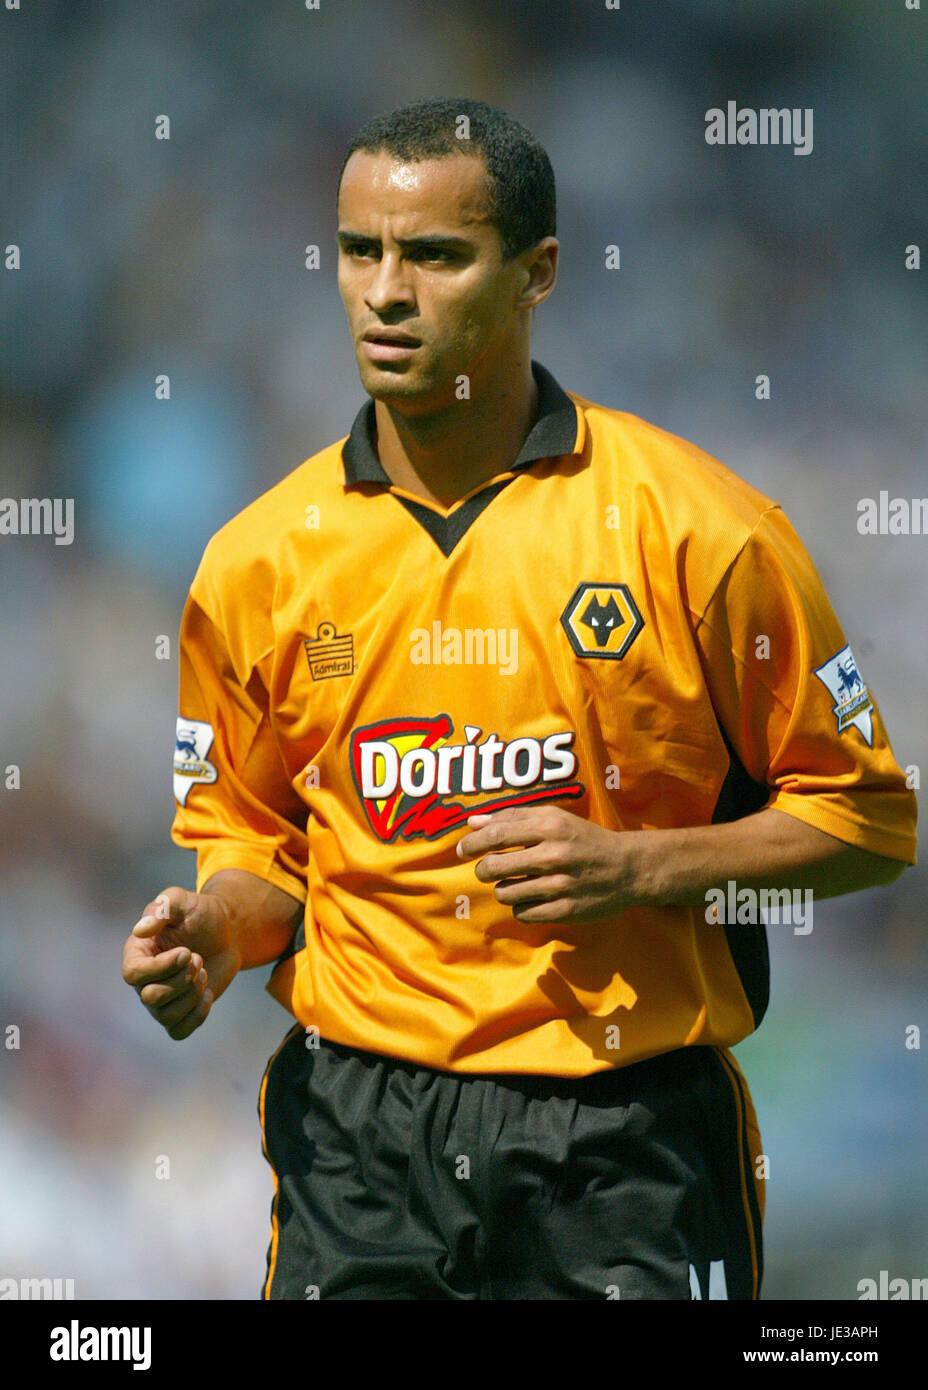 SILAS WOLVERHAMPTON WANDERERS FC EWOOD PARK BLACKBURN ENGLAND 16 August 2003 - Stock Image